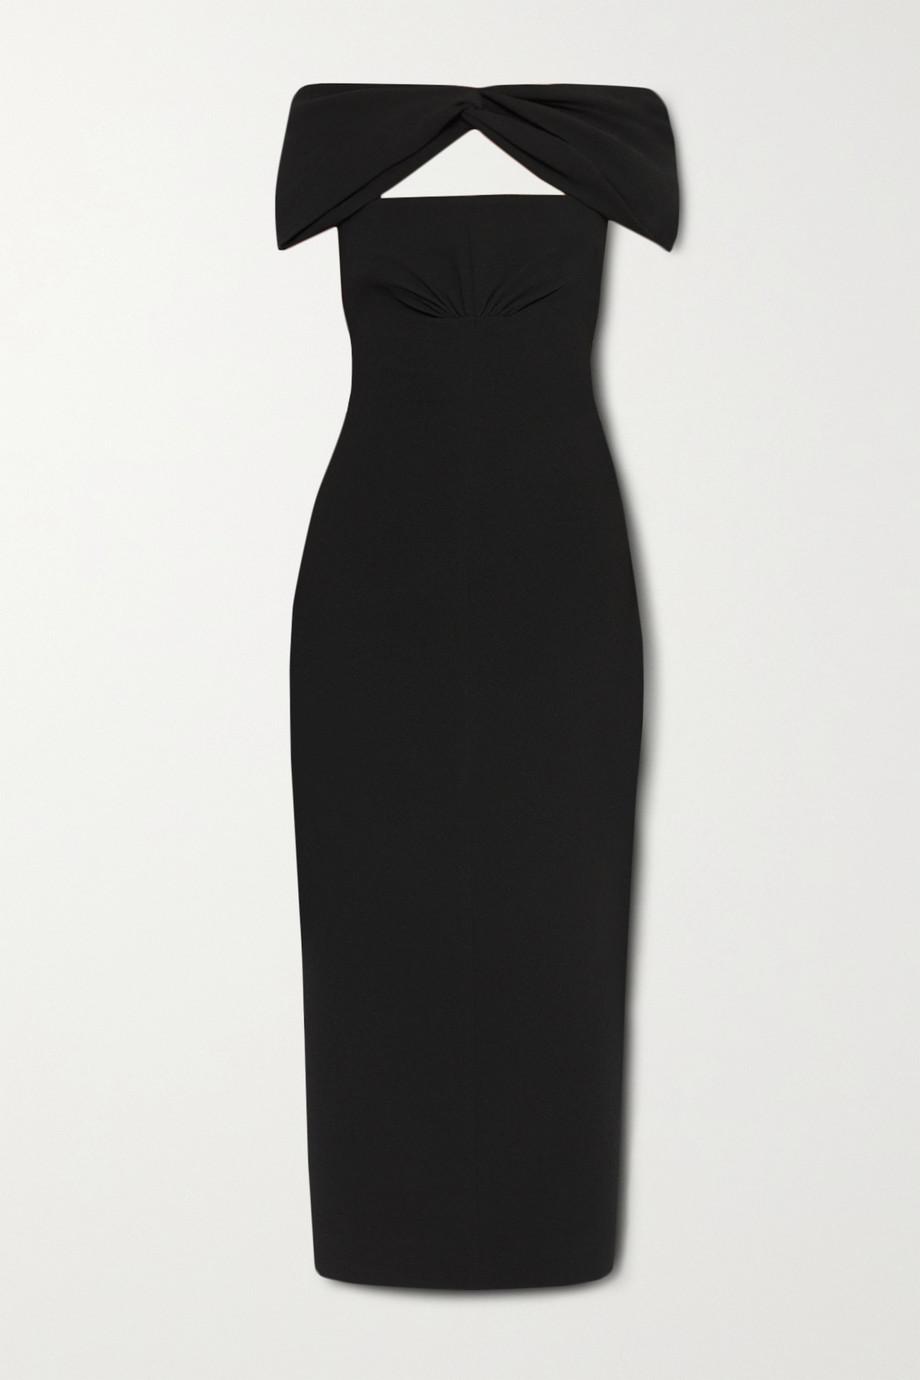 Emilia Wickstead Padma off-the-shoulder cutout crepe midi dress